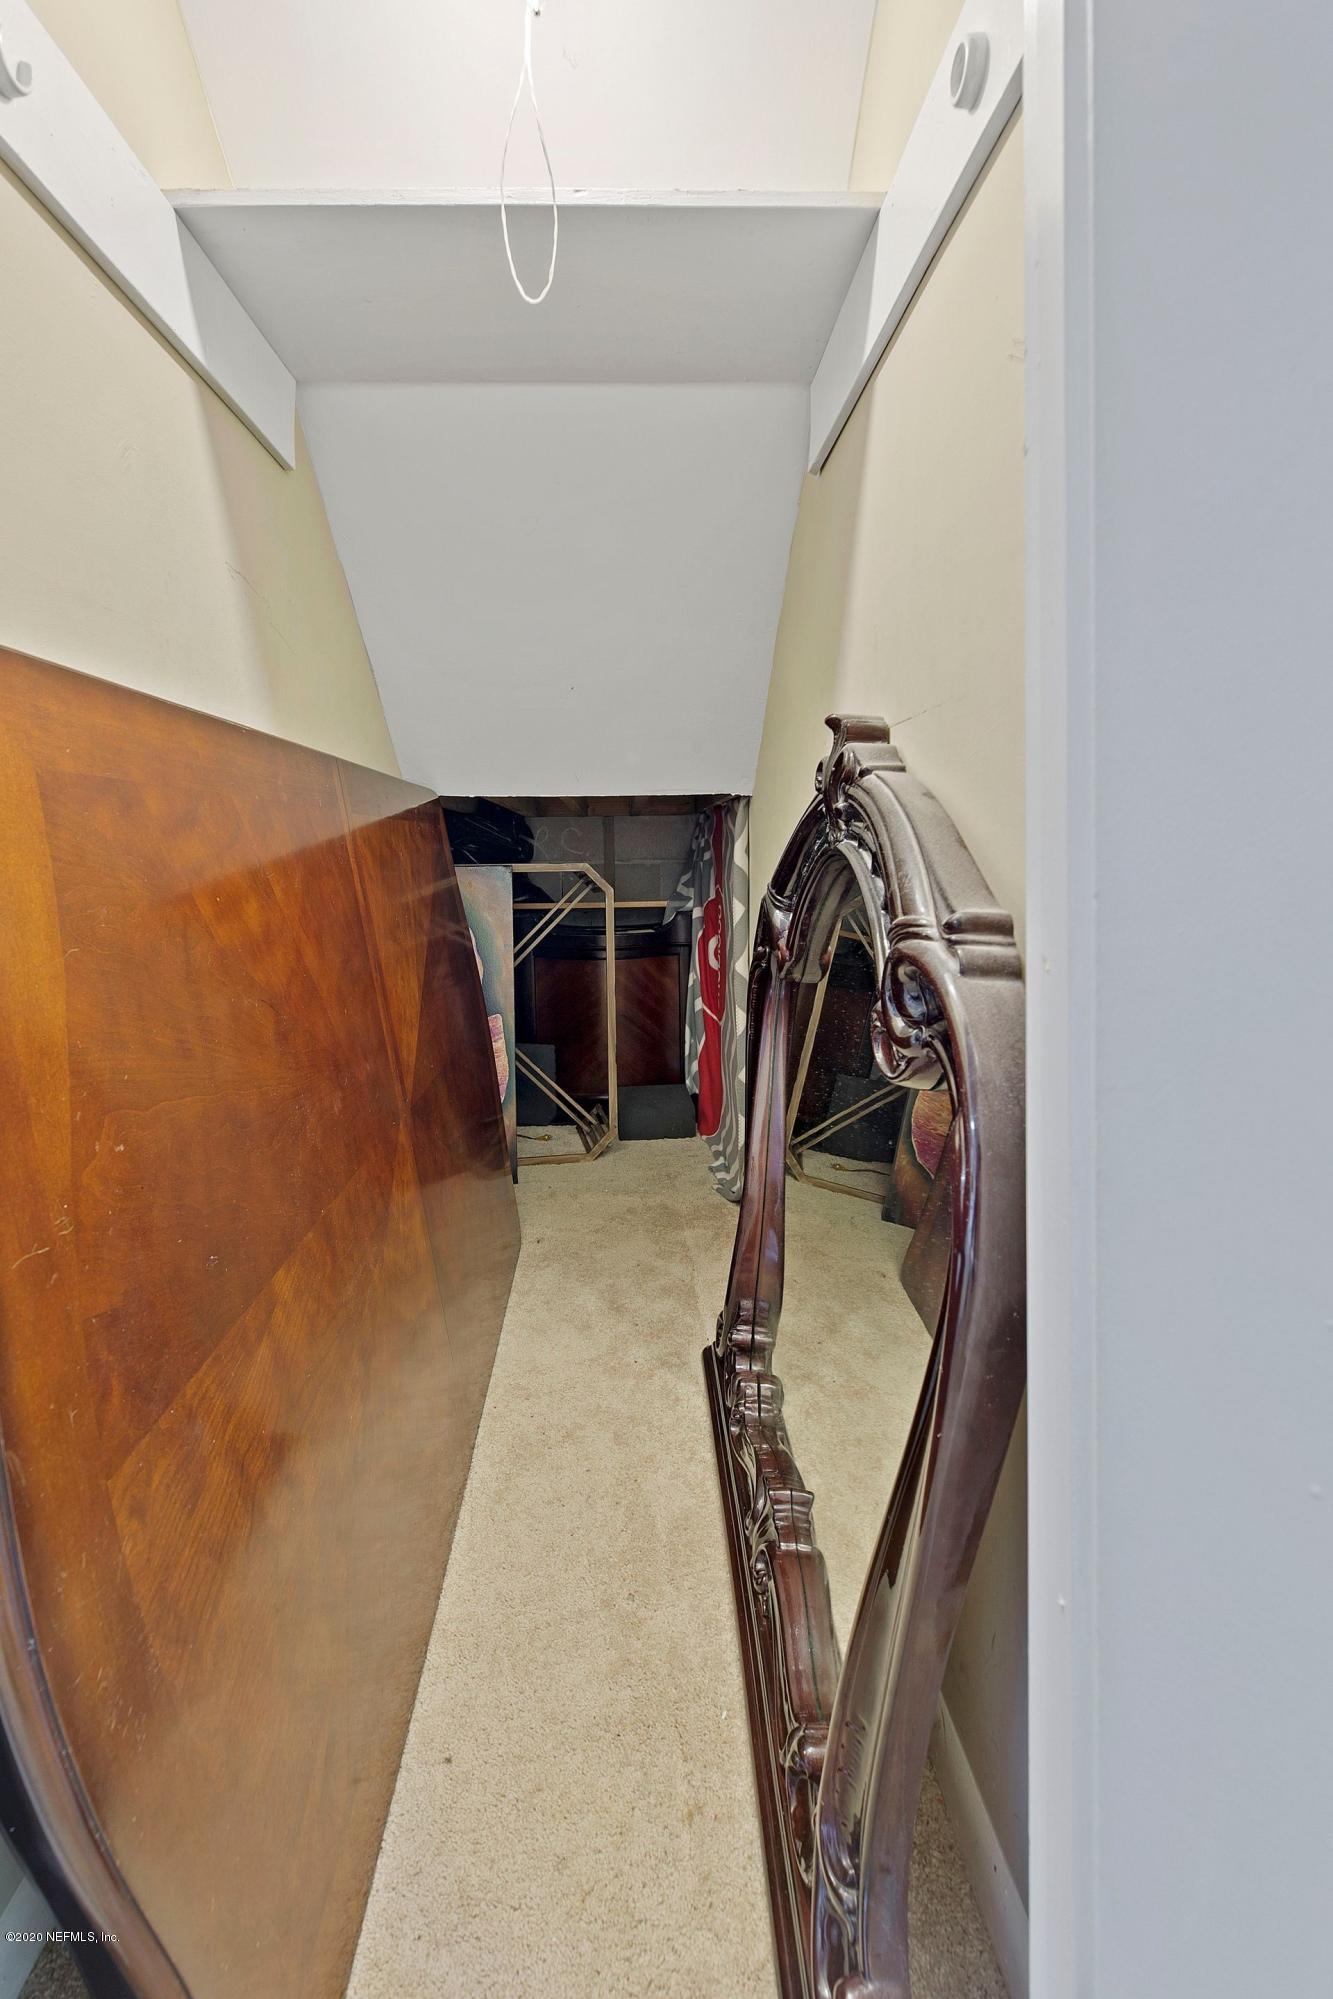 5832 GUMWOOD, JACKSONVILLE, FLORIDA 32277, 4 Bedrooms Bedrooms, ,2 BathroomsBathrooms,Residential,For sale,GUMWOOD,1082704